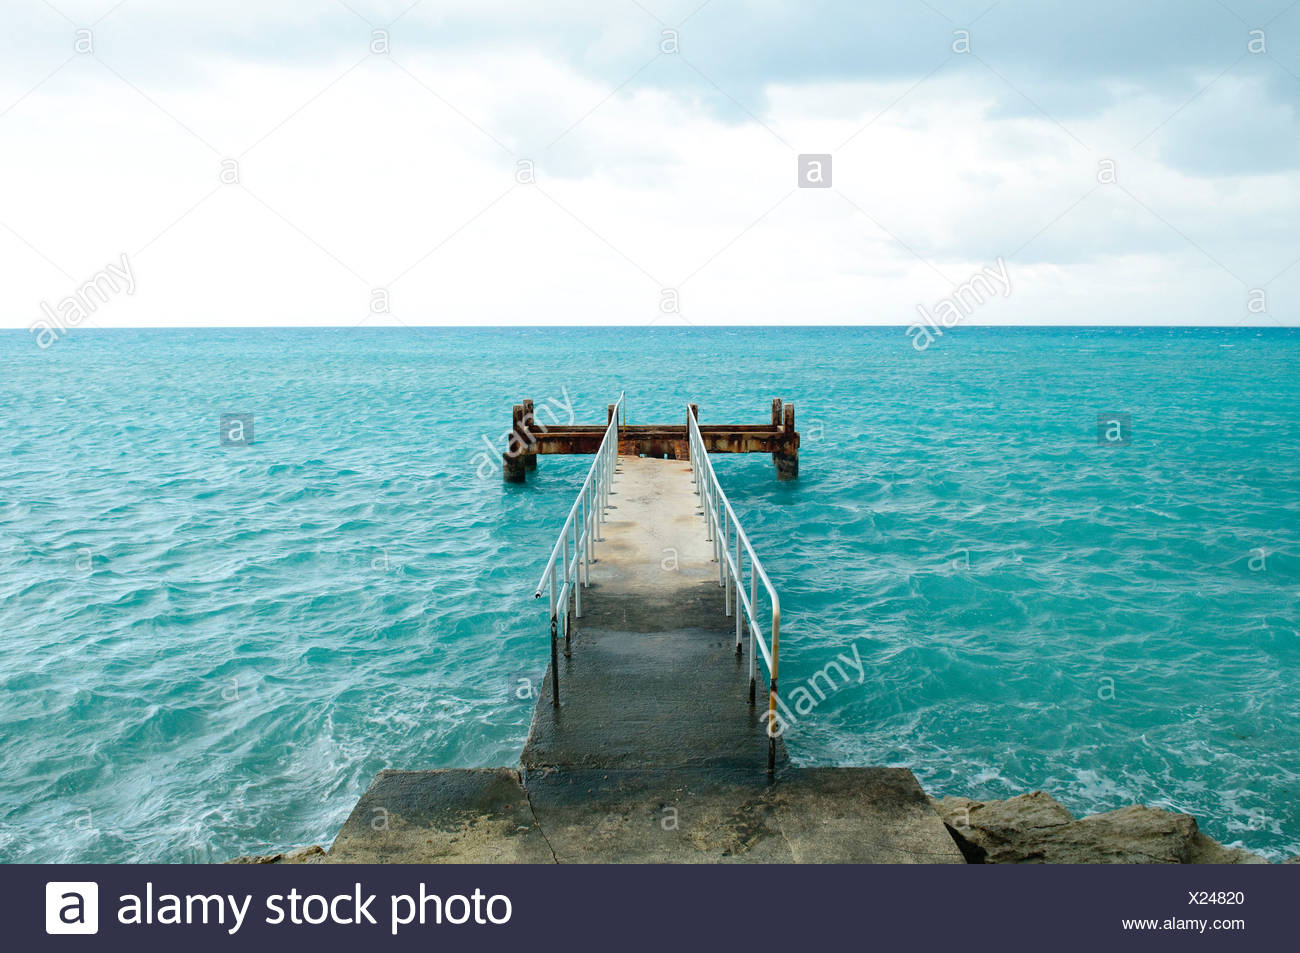 Pier going into blue sea, St. George's Parish, Bermuda - Stock Image